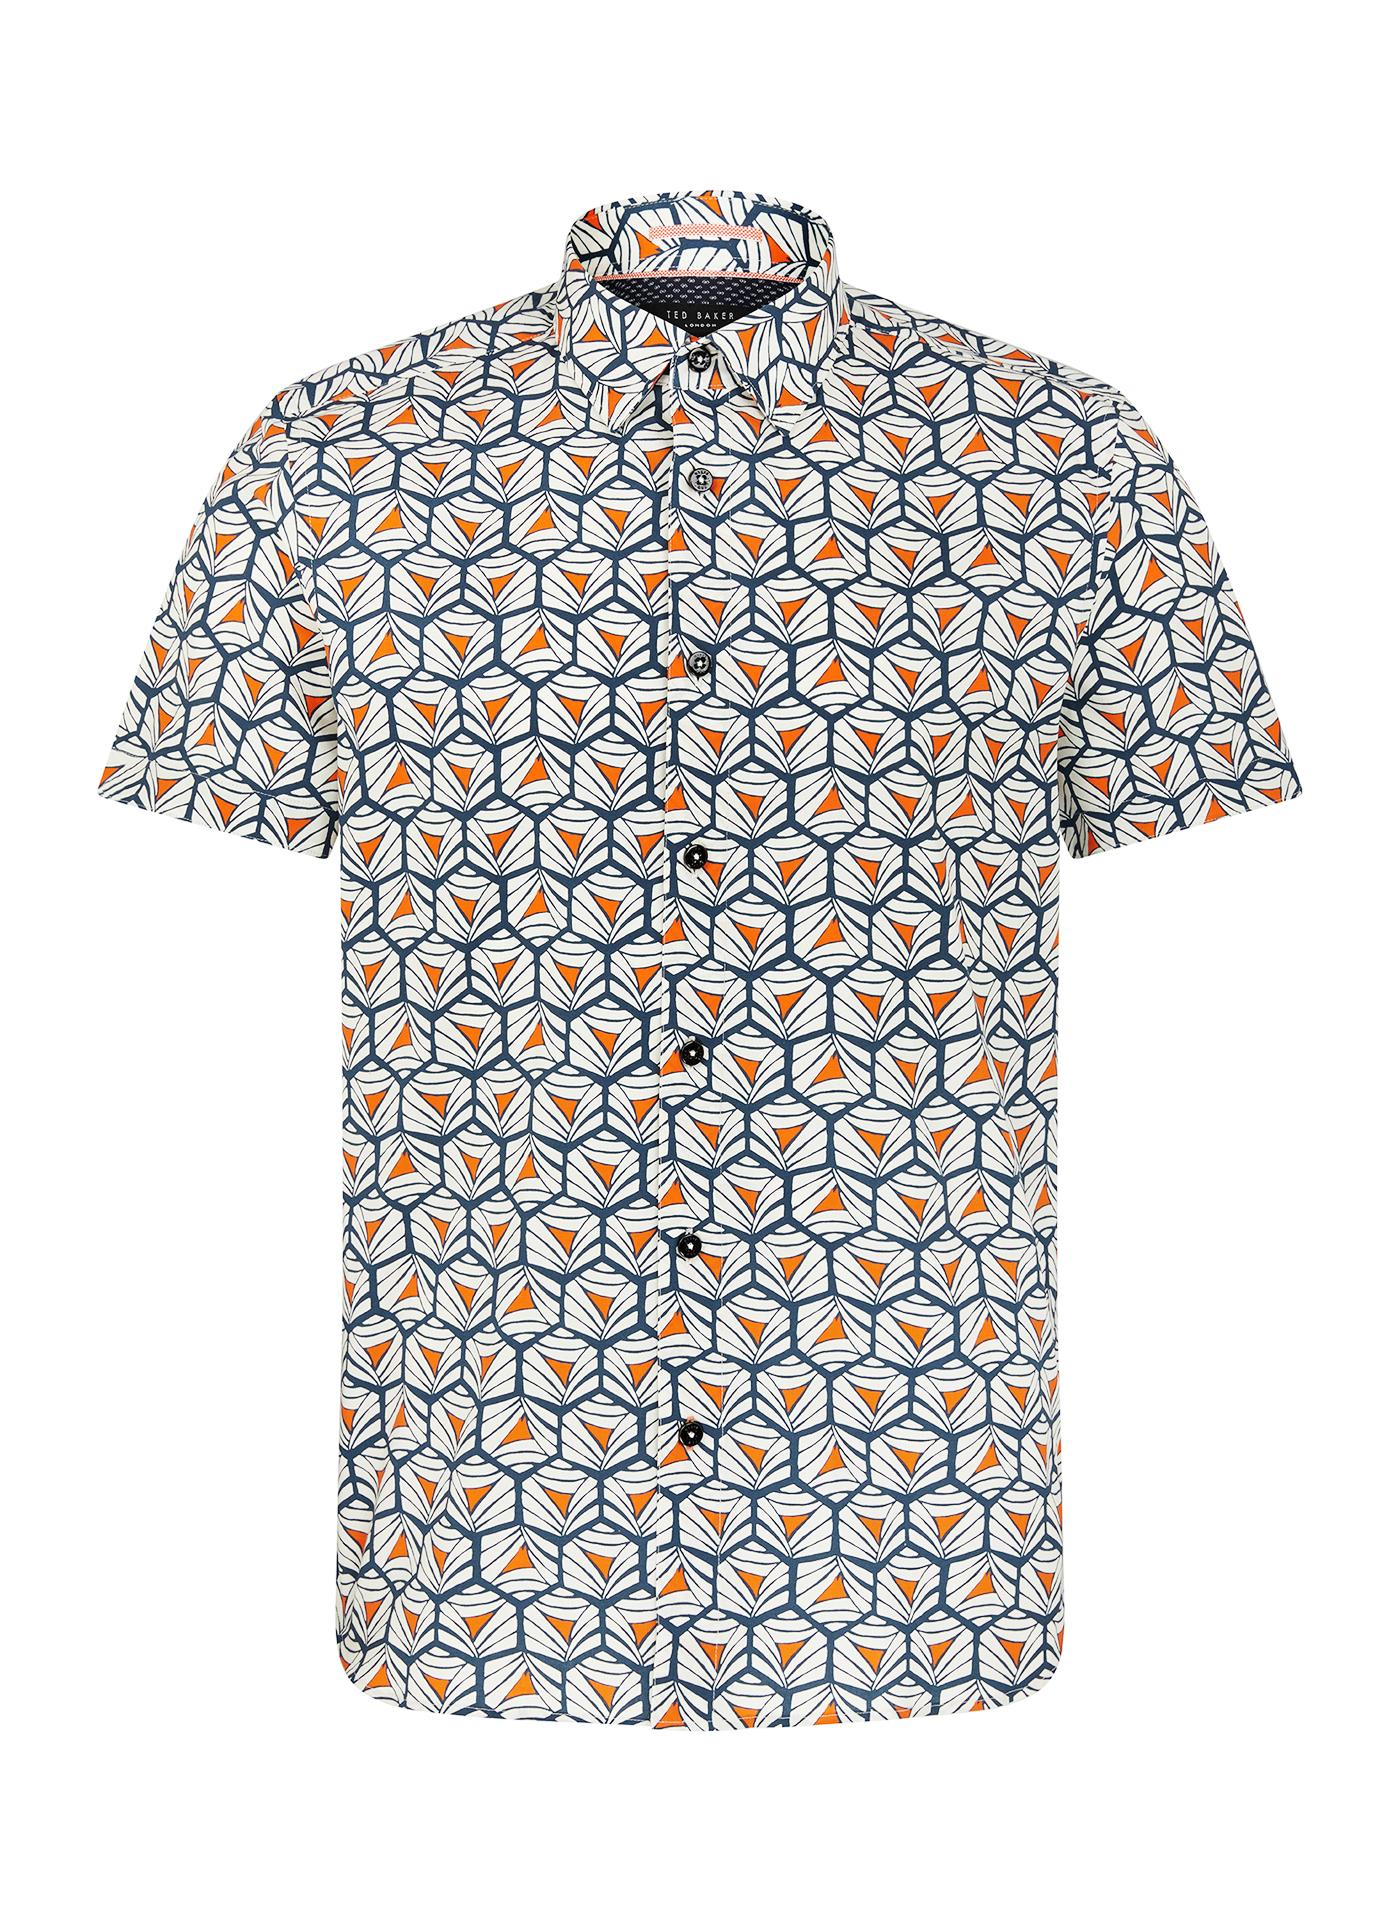 Ted Baker light grey pattern short sleeve shirt